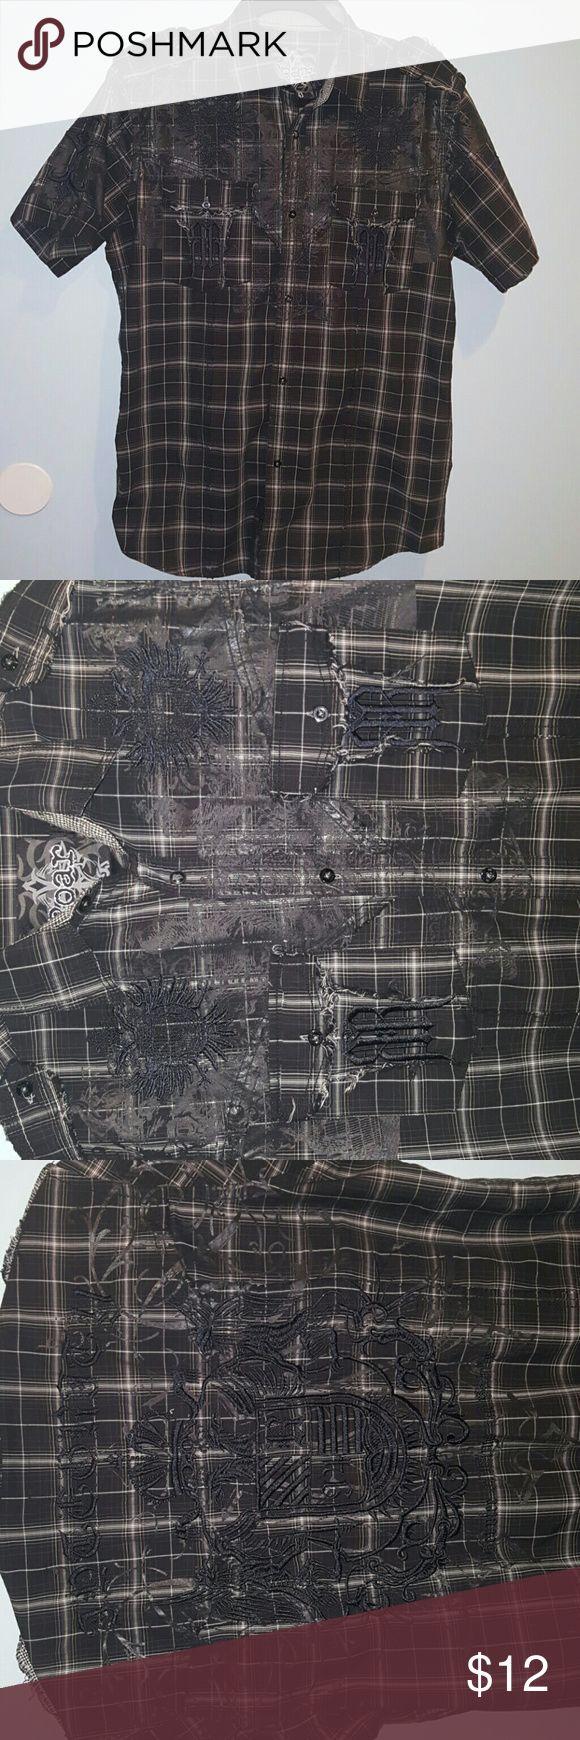 Roar men's button down shirt size L Roar men's button down shirt size L Roar Shirts Casual Button Down Shirts